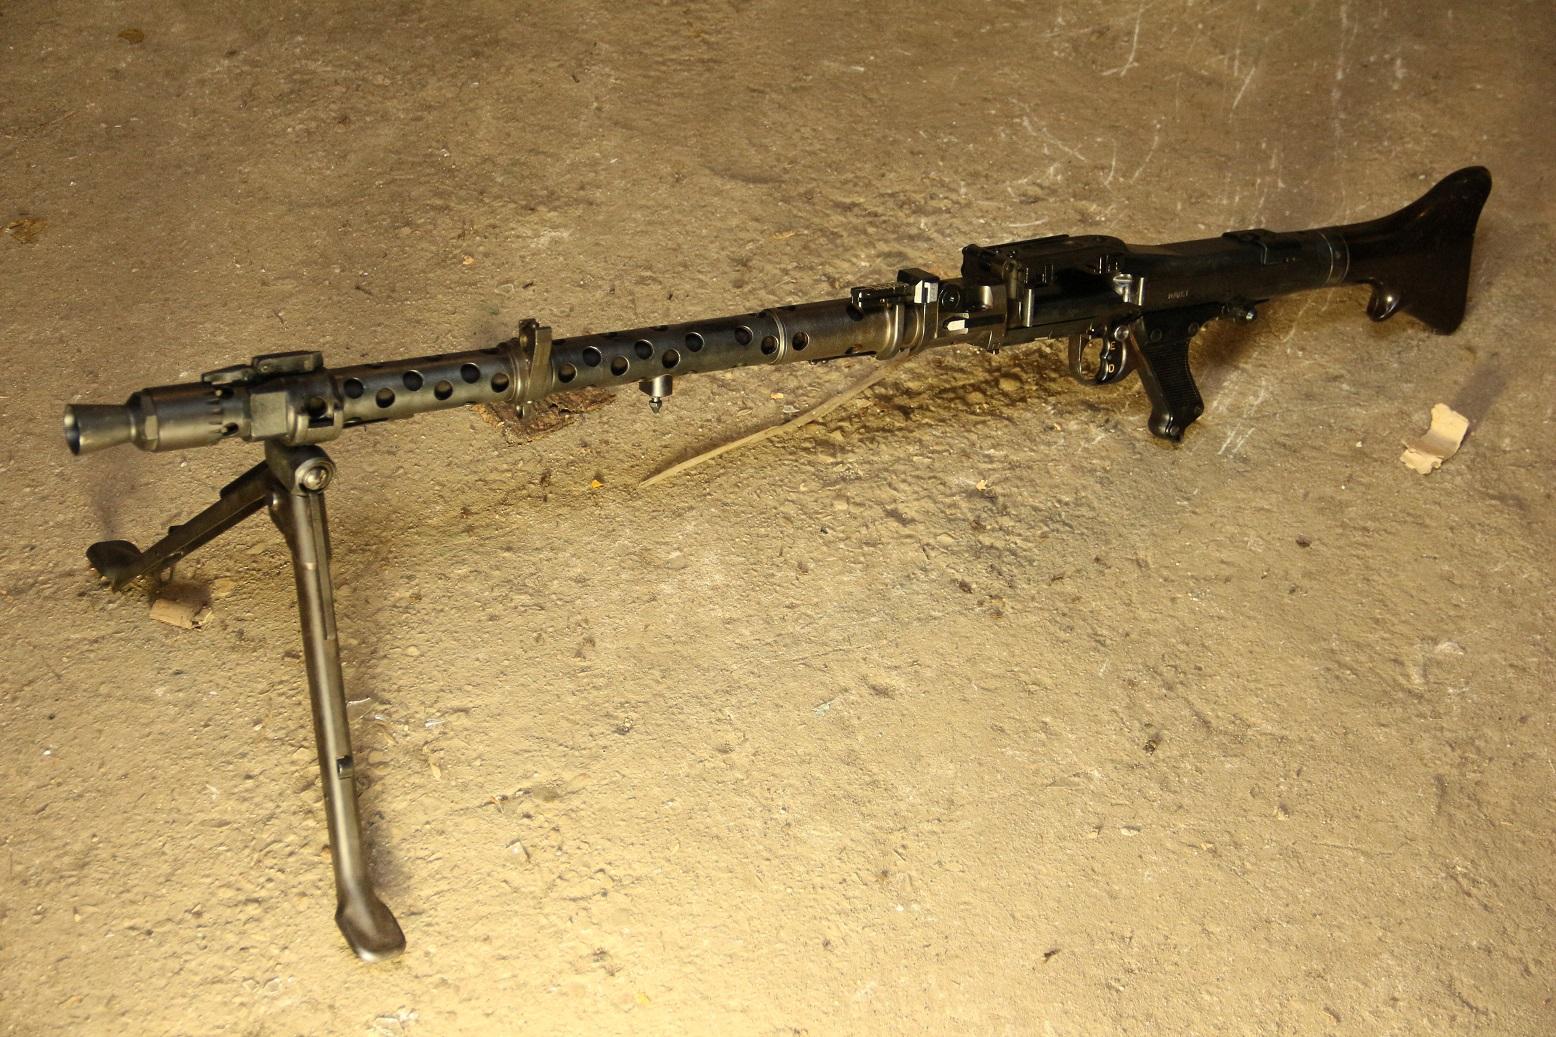 Немецкий пулемет MG-34, #5764a, 1943 год, dot Waffenwerke Bruenn AG, Brno, Czechoslovakia